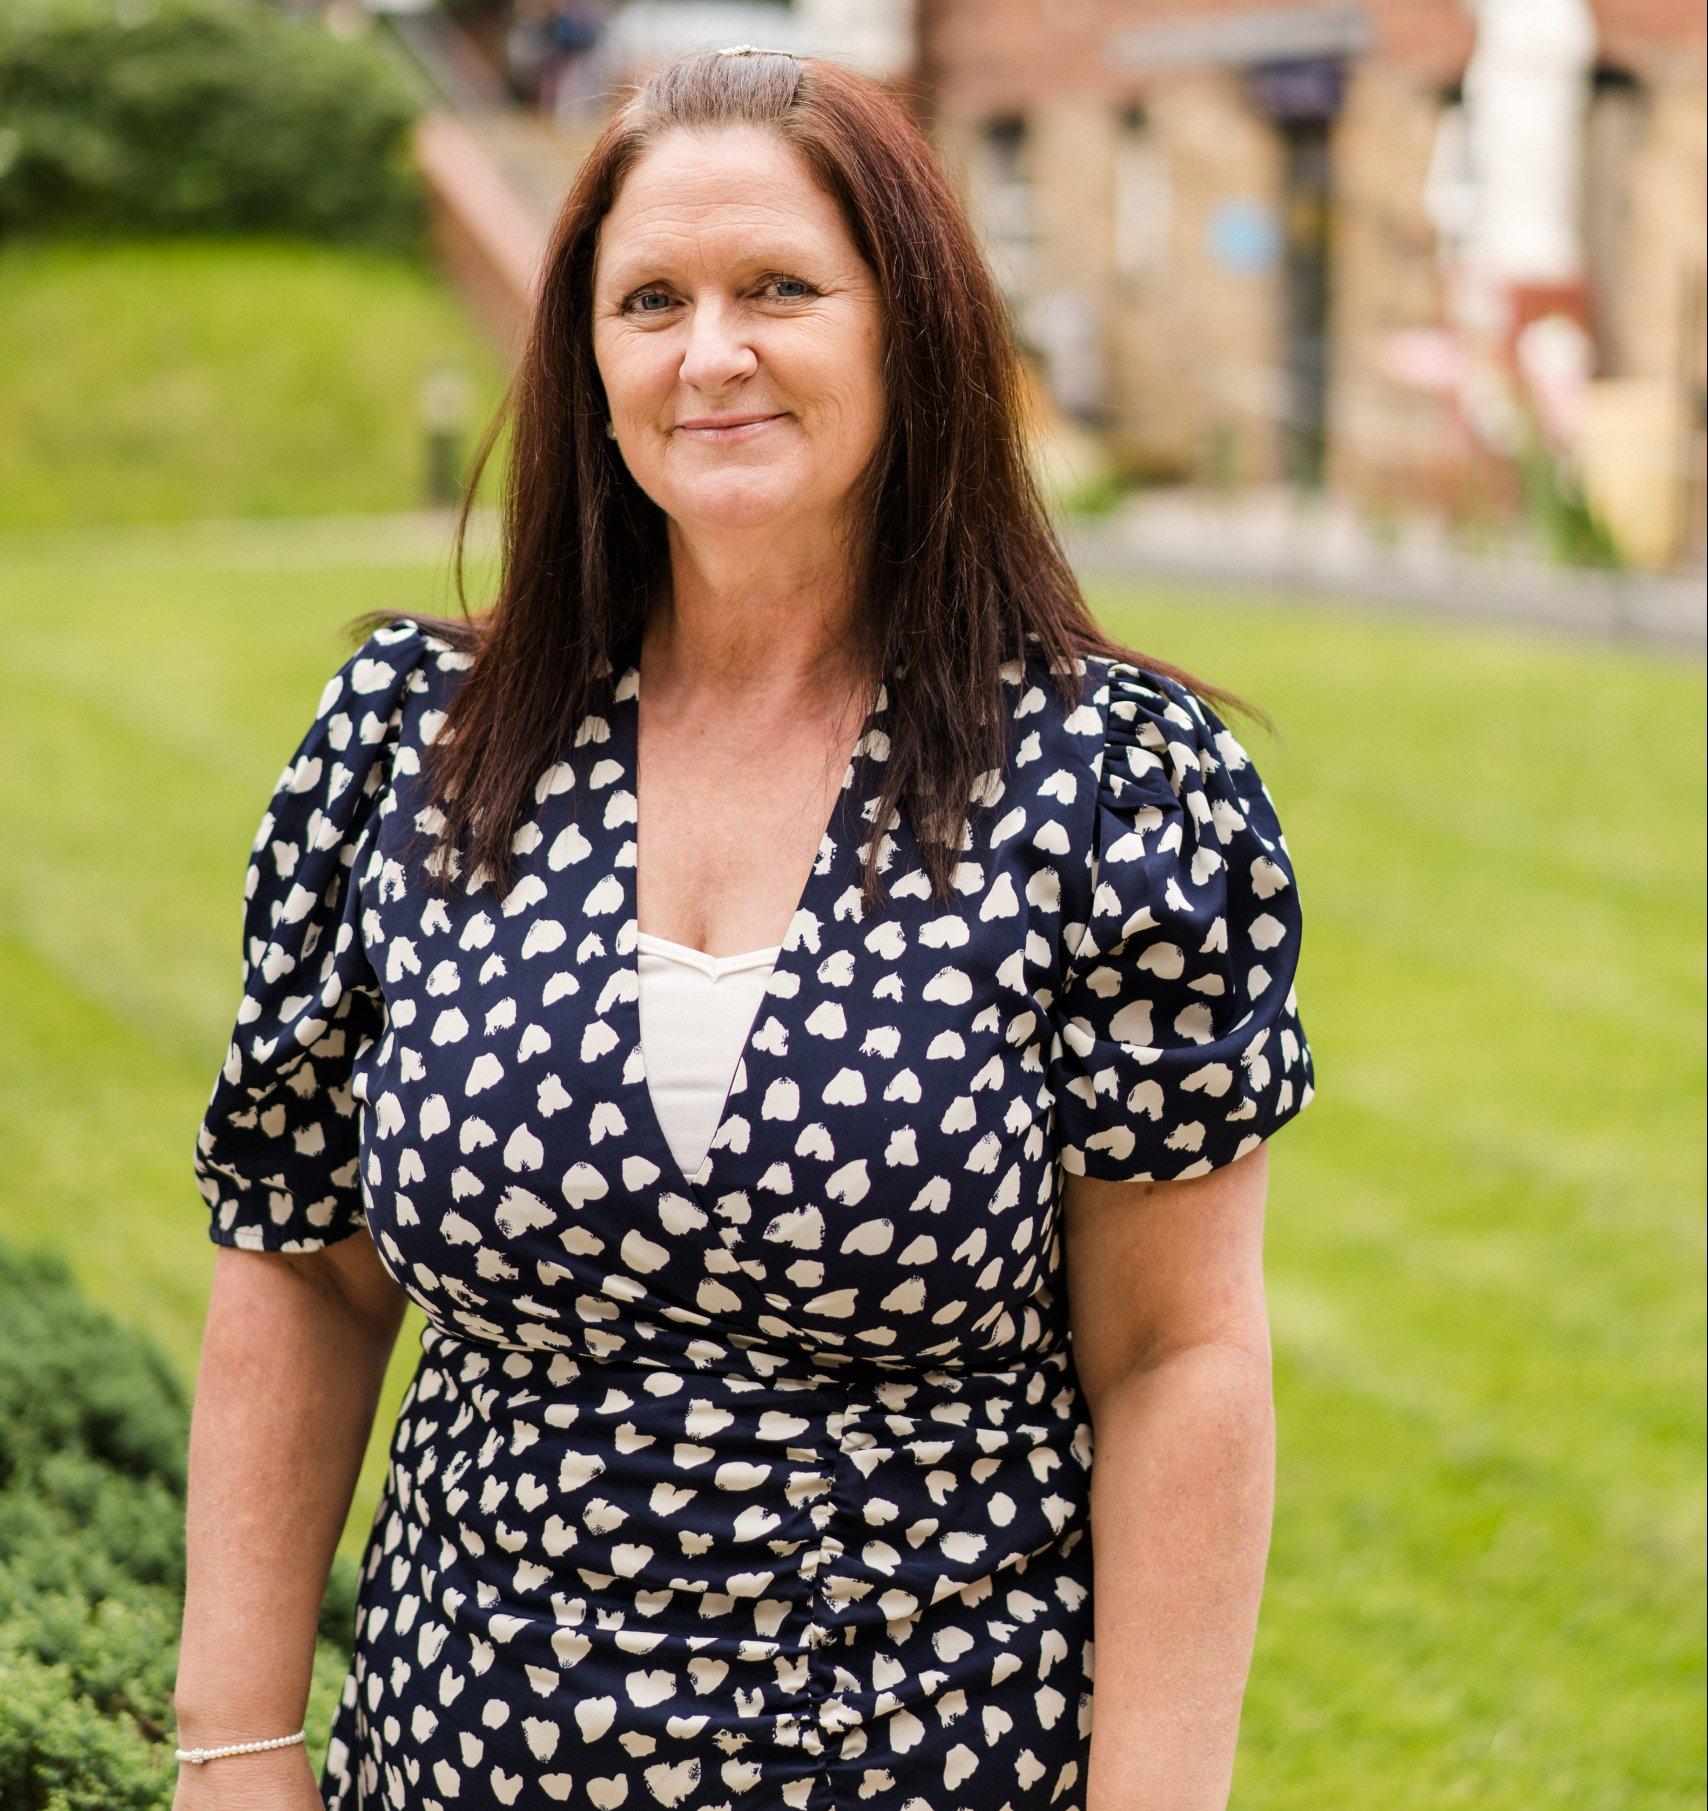 Tracey Hopkinson: I Care… Ambassador